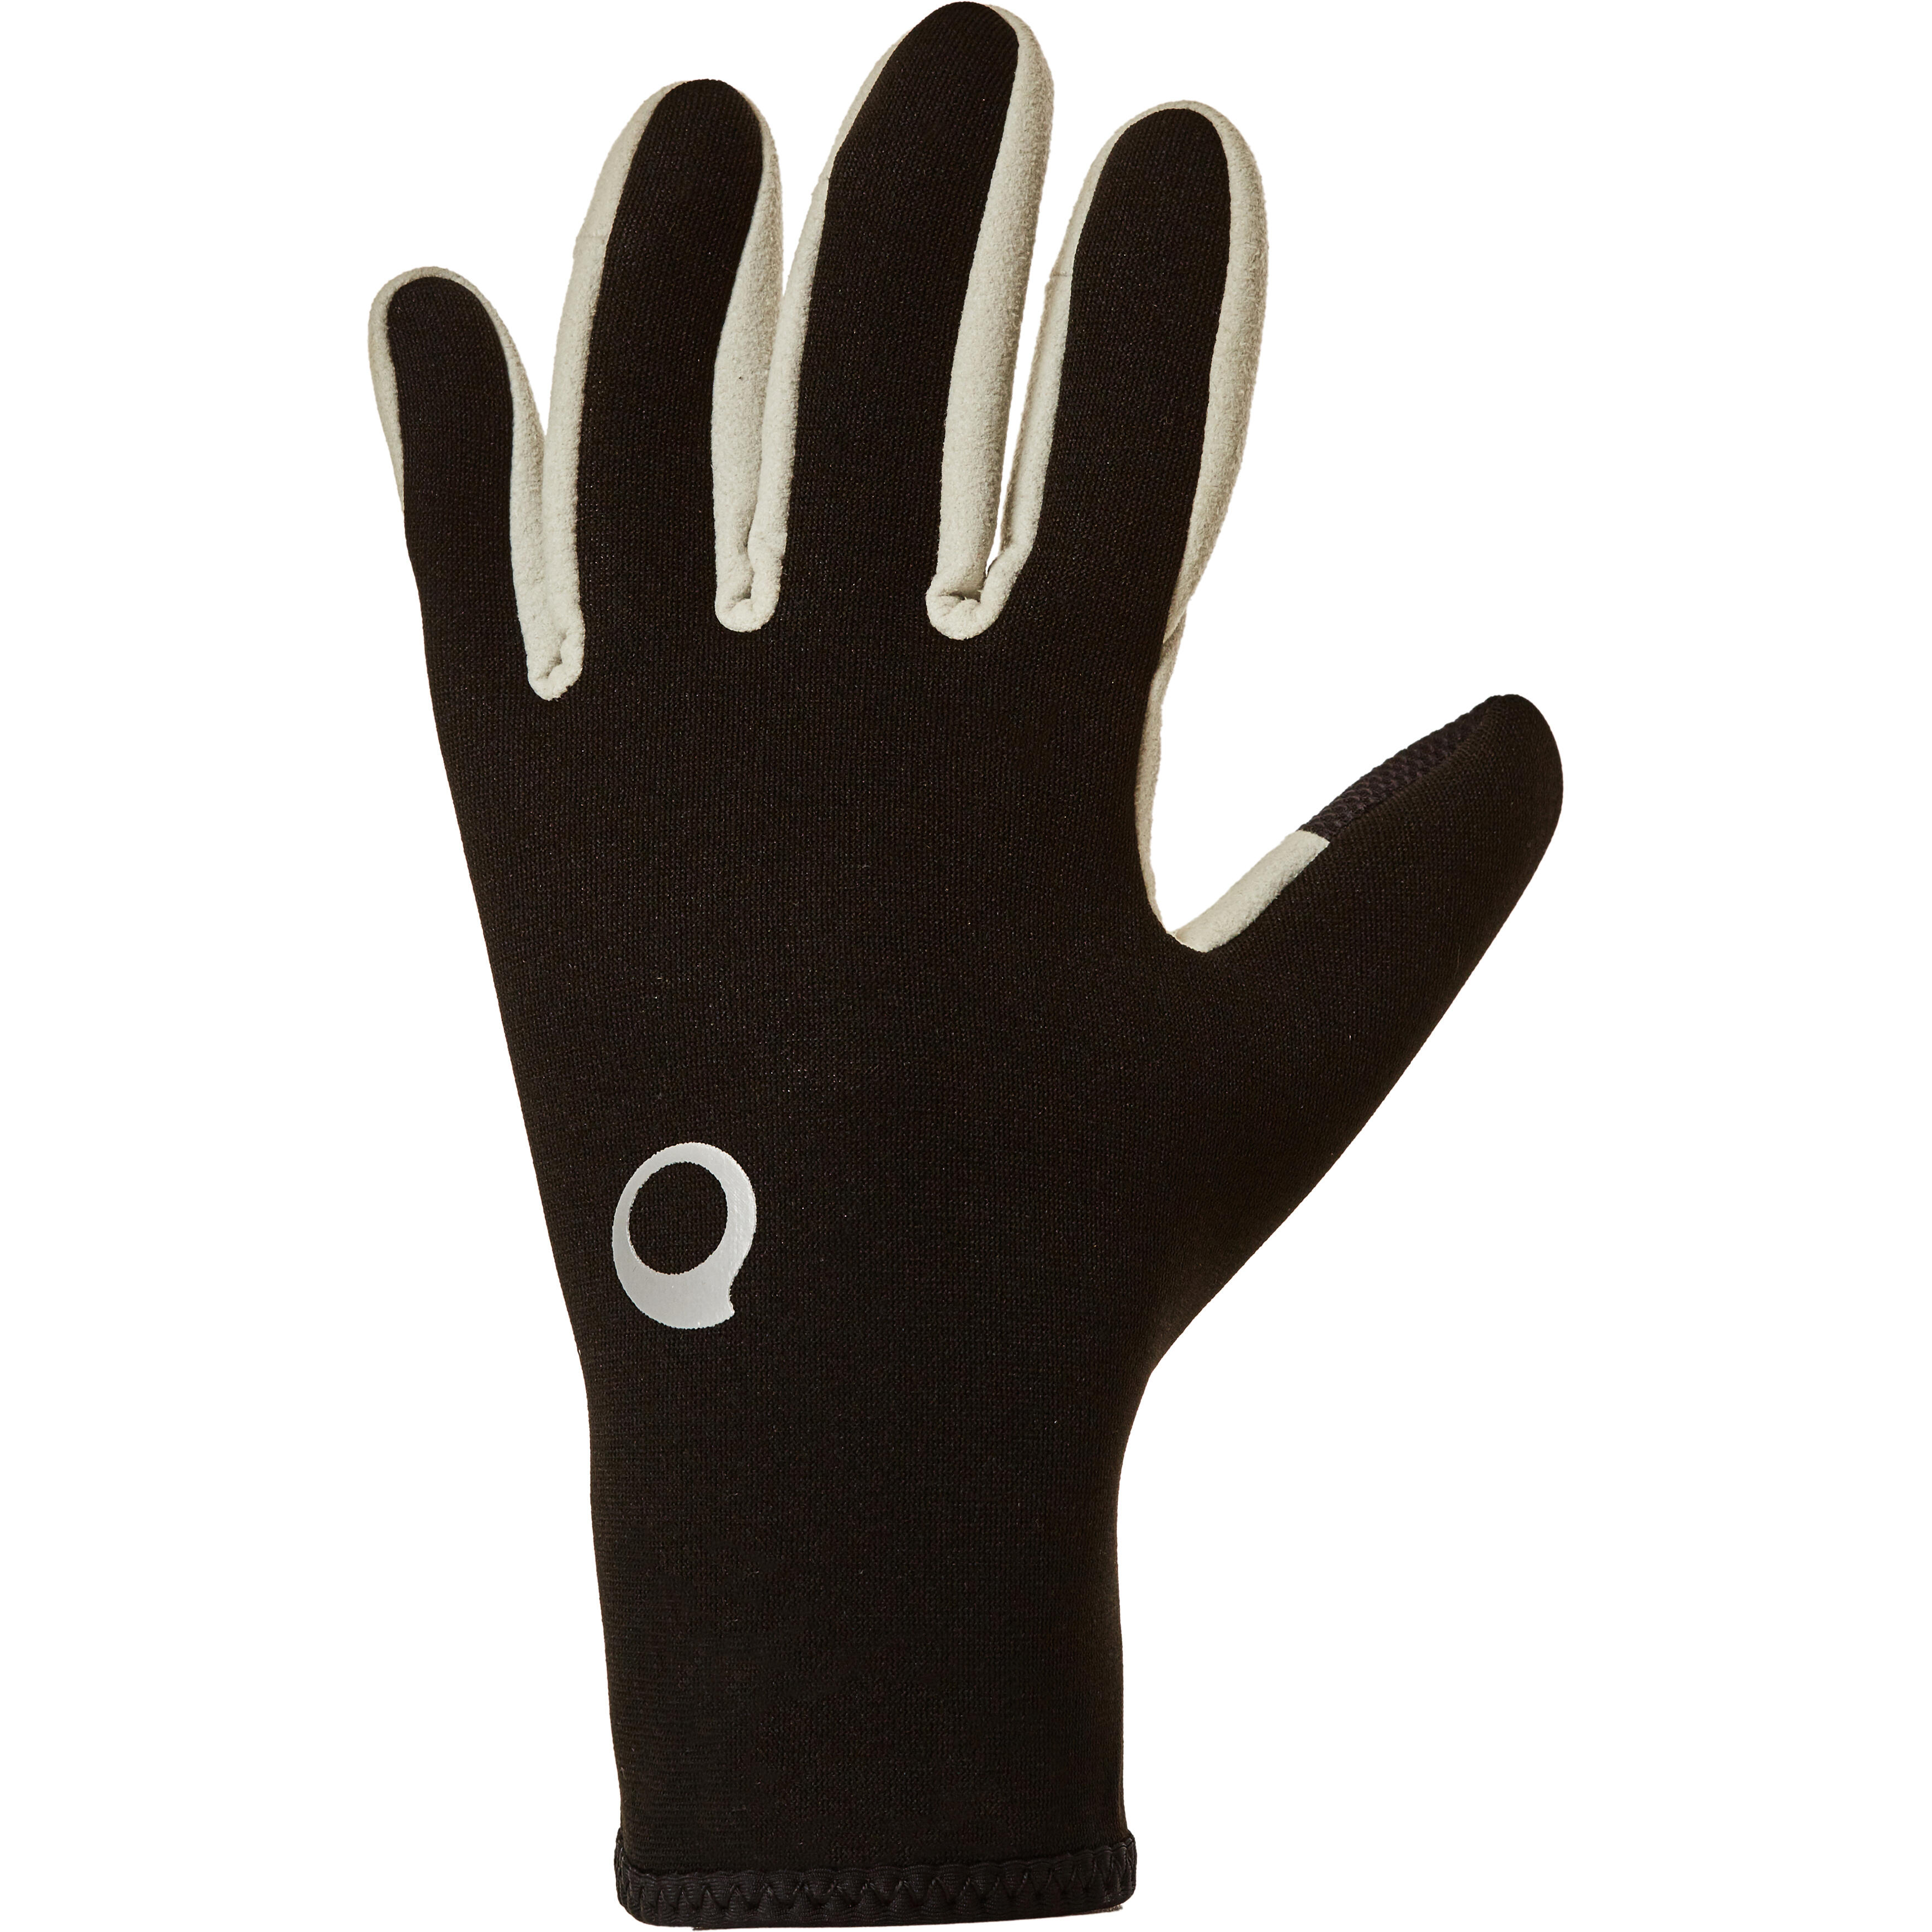 Neoprenhandschuhe Tauchen SPF 500 Neopren 2 mm verstärkt Supratex | Accessoires > Handschuhe | Schwarz | Subea